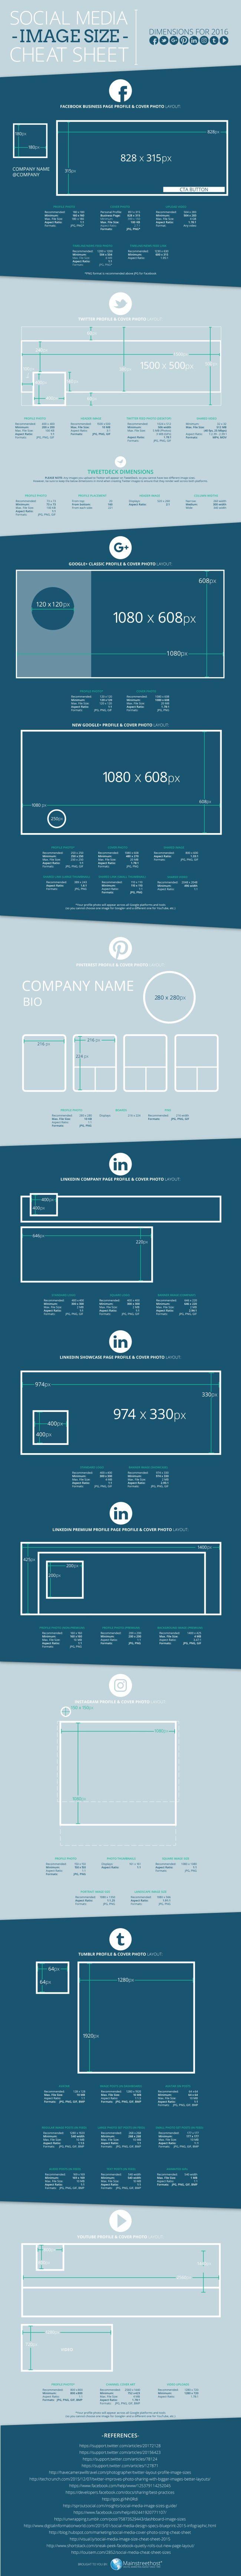 Social Media Image Sizes for 2016 [Infographic] | Social Media Today